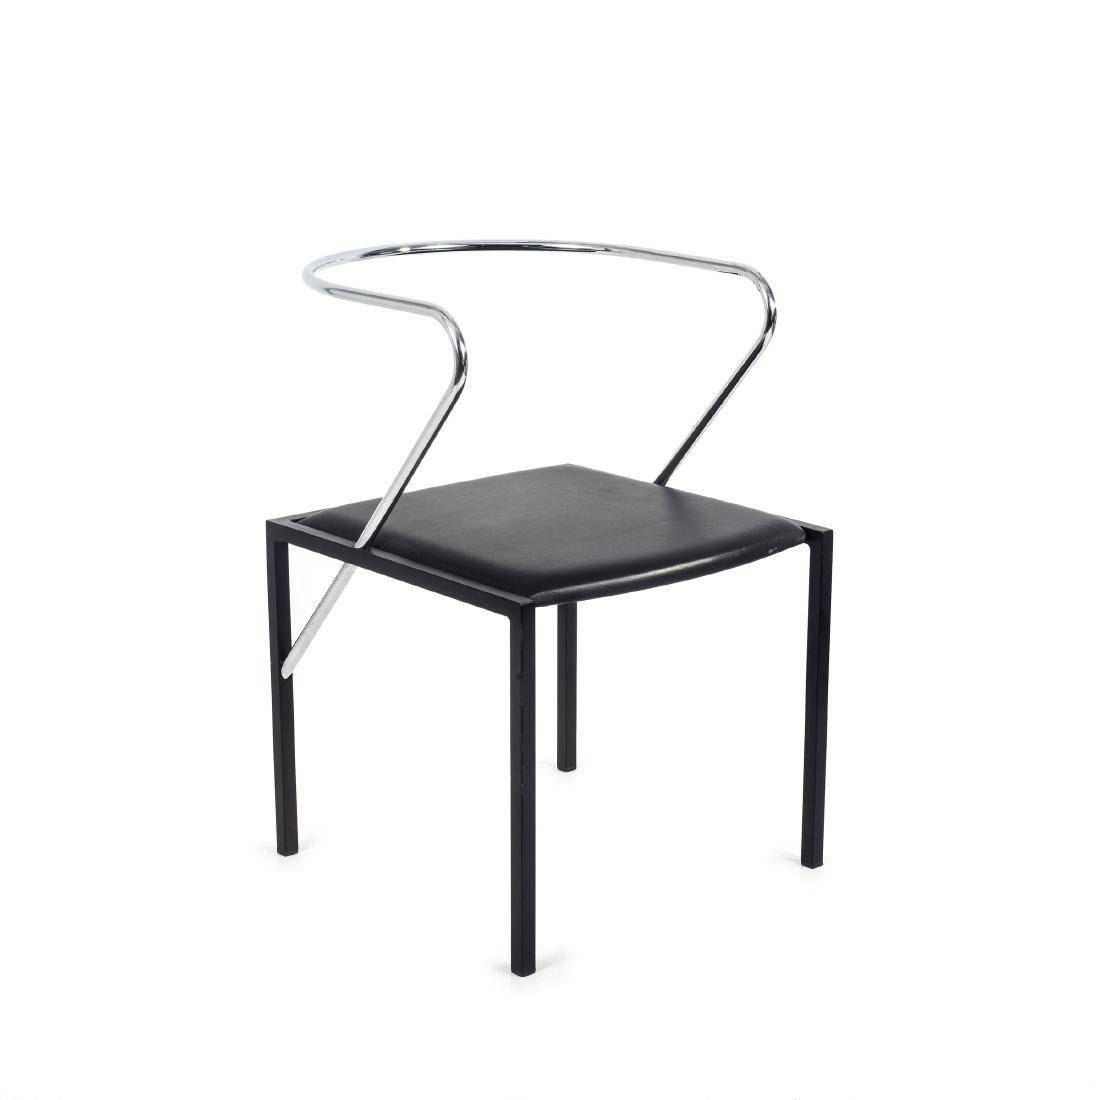 'Apple Honey chair', 1985